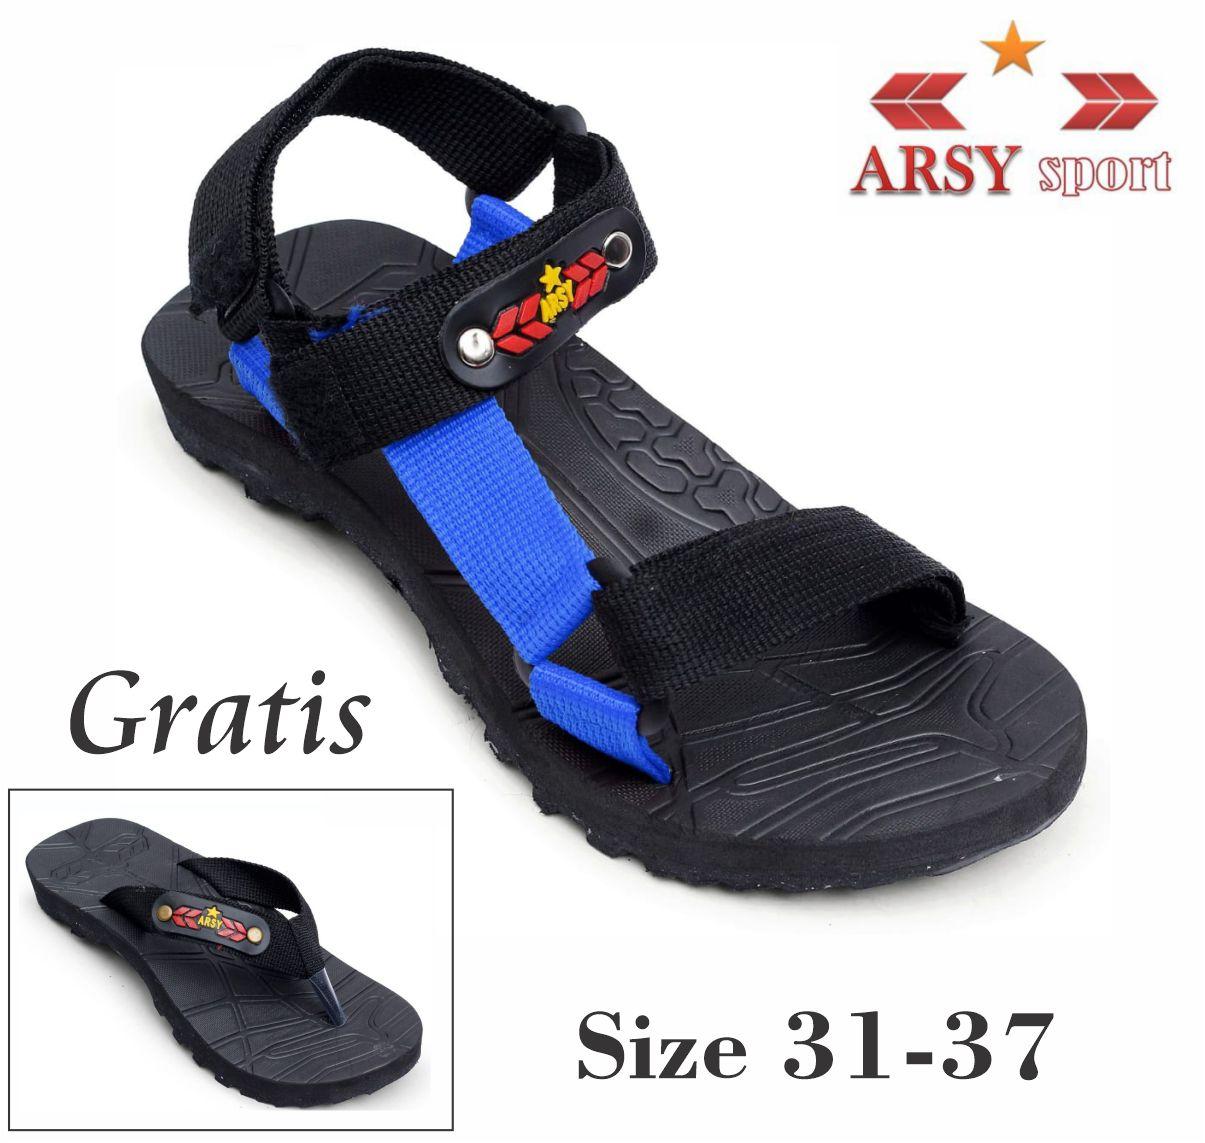 Arsy Sport / Sandal Gunung Anak / Sandal Gunung / Sandal Baby / Sandal Anak Size 31-37 Gratis Sandal Jepit